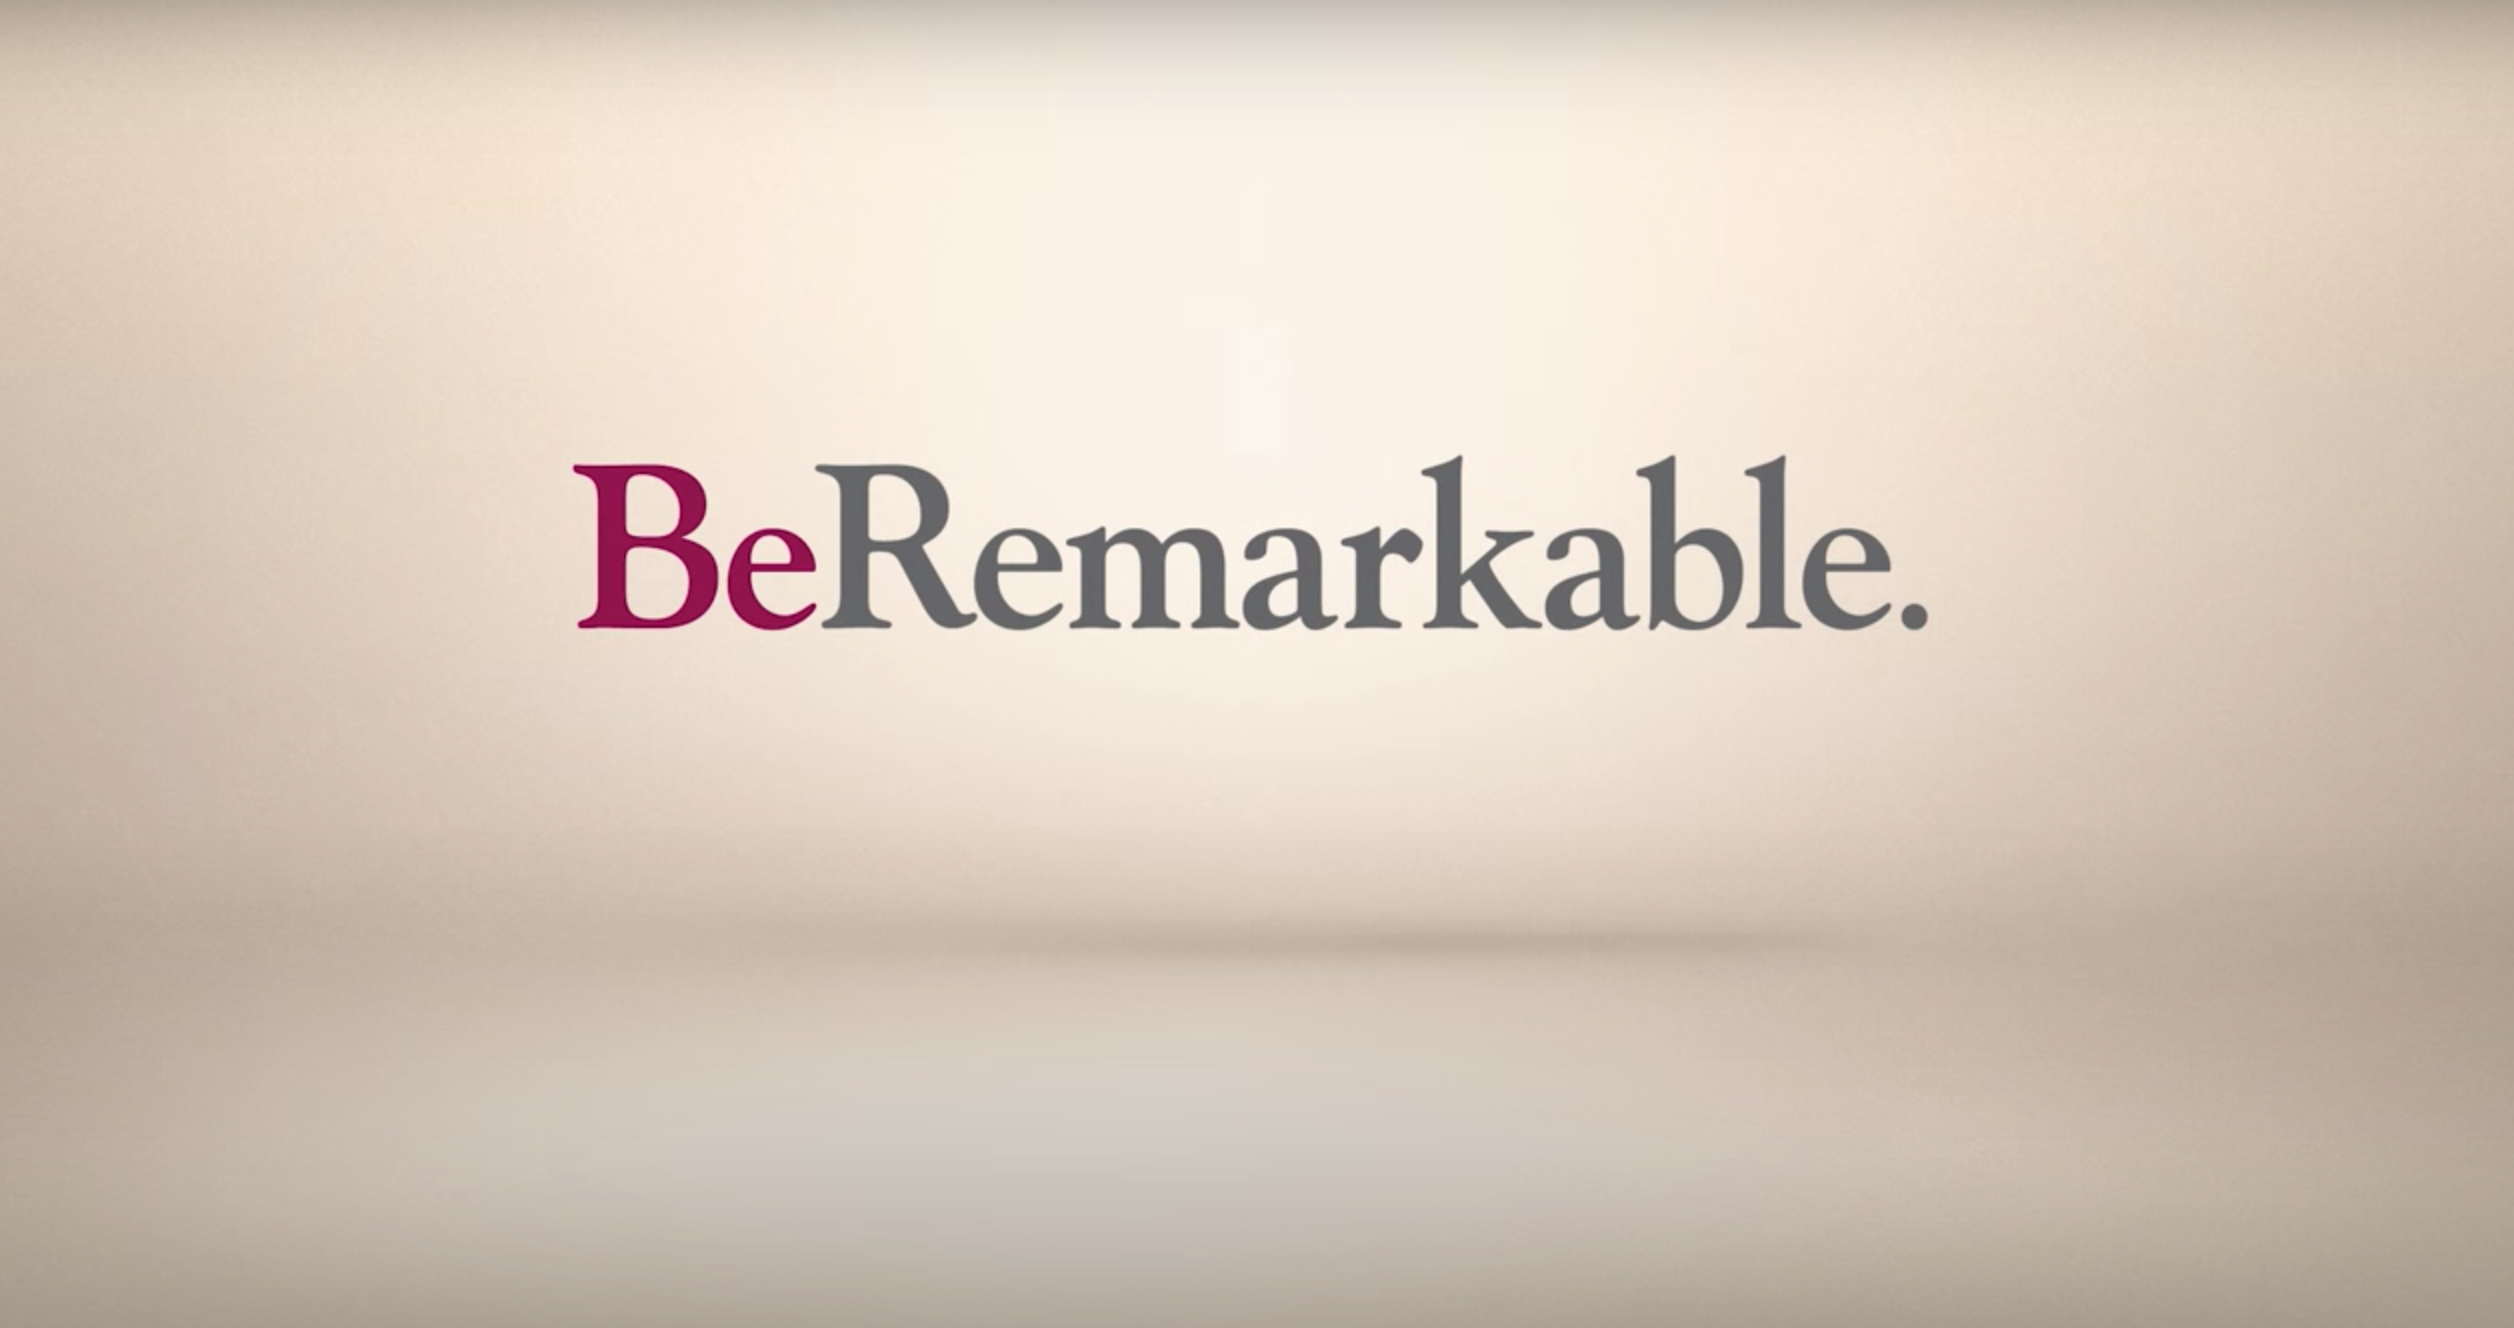 BeRemarakble Video